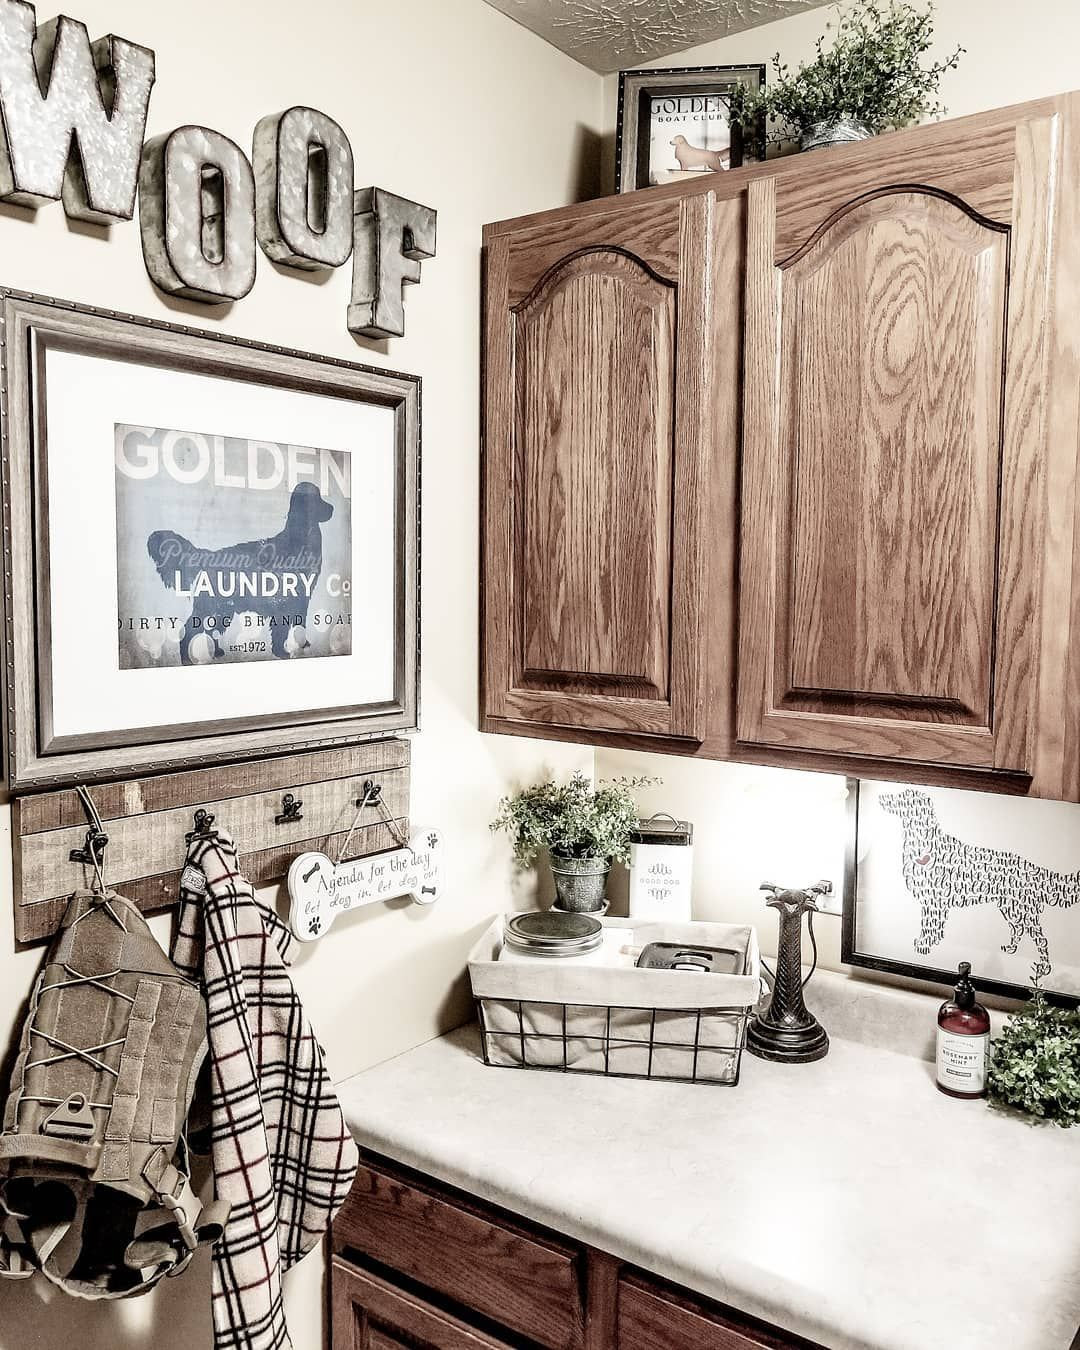 Rustic Farmhouse Dog Room/ Laundry Room. Laura on